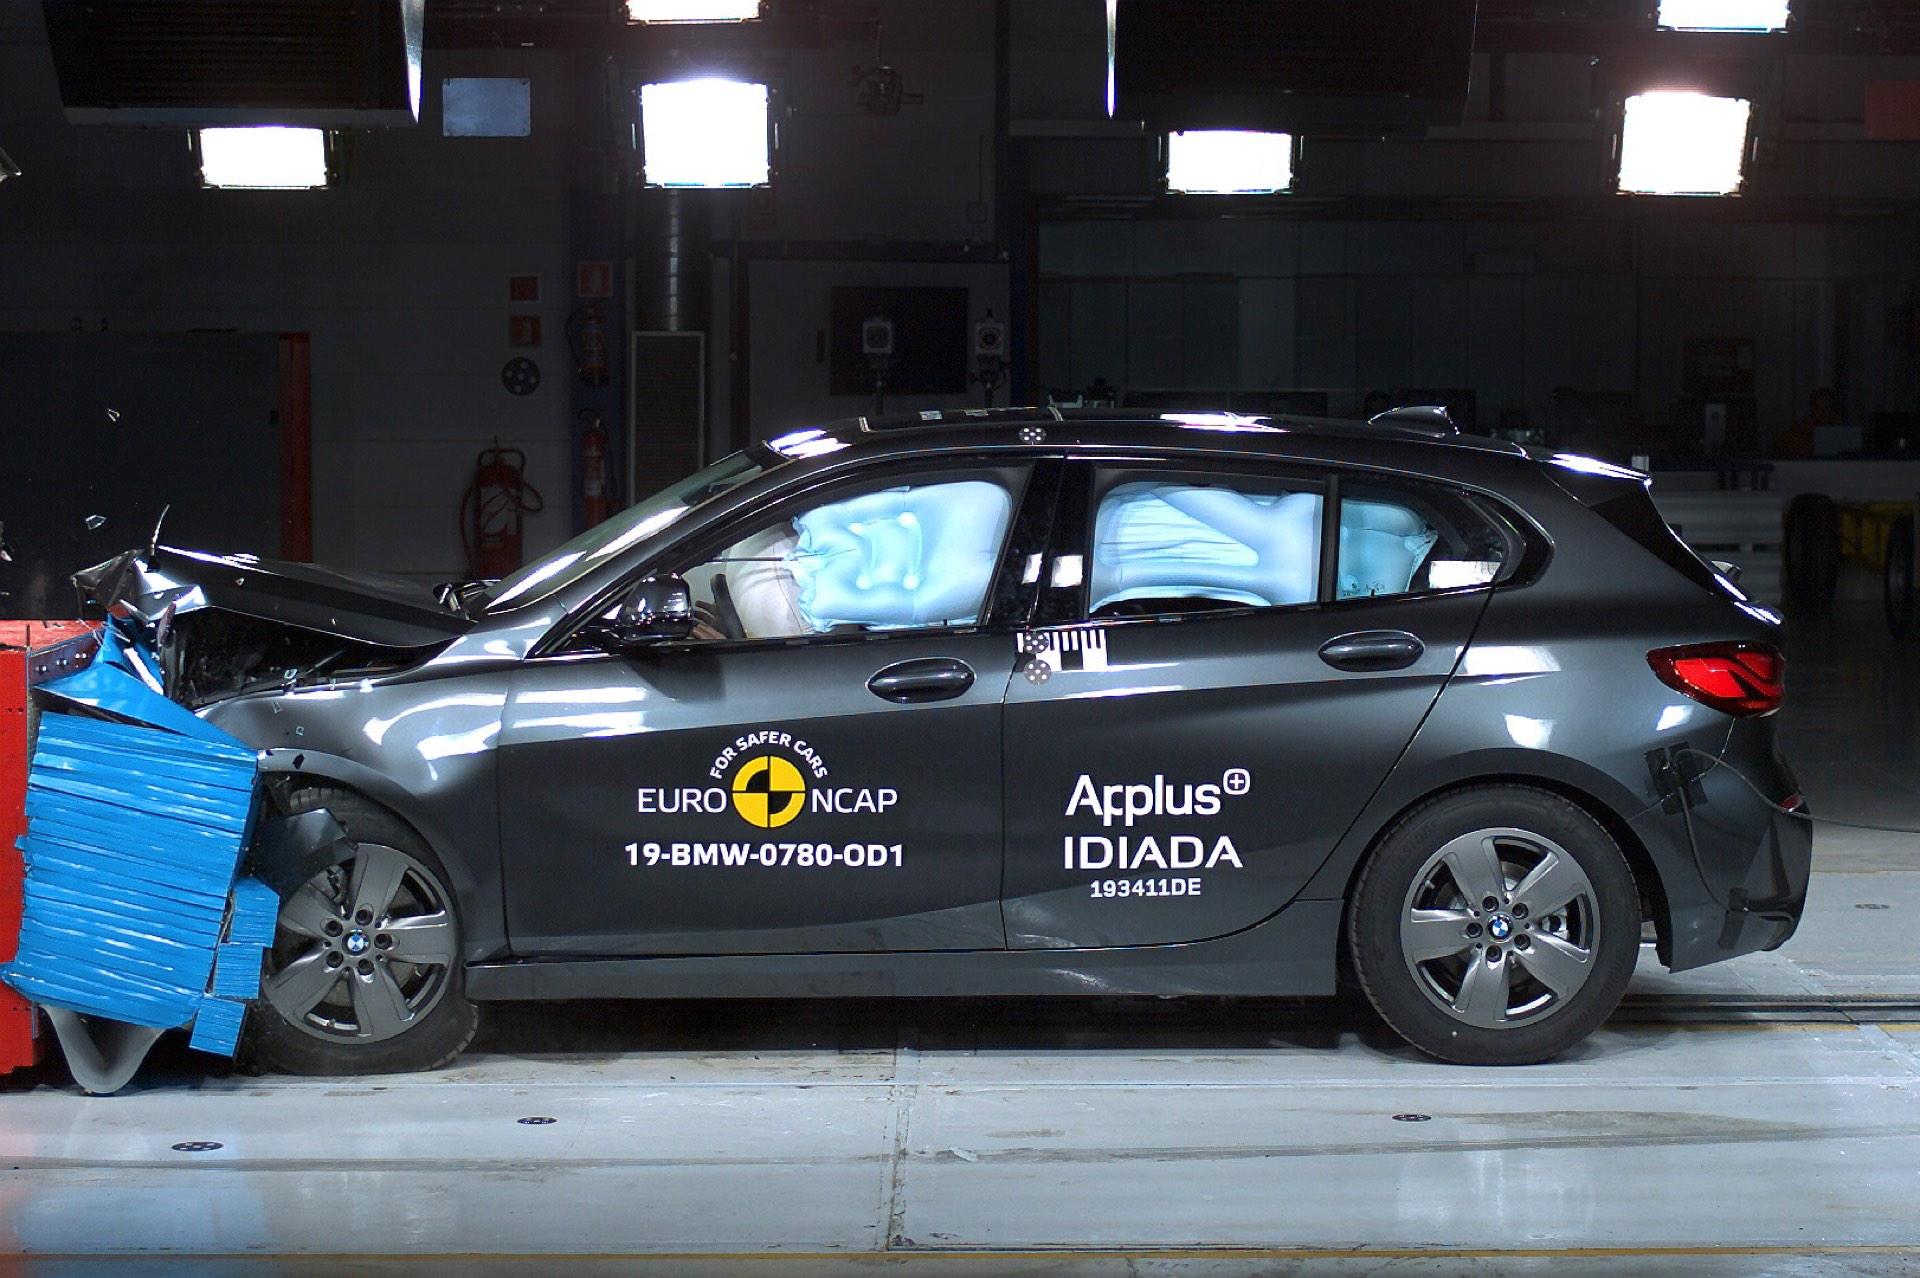 2019 BMW 1er F40 Euro NCAP Crashtest 5 Sterne 02